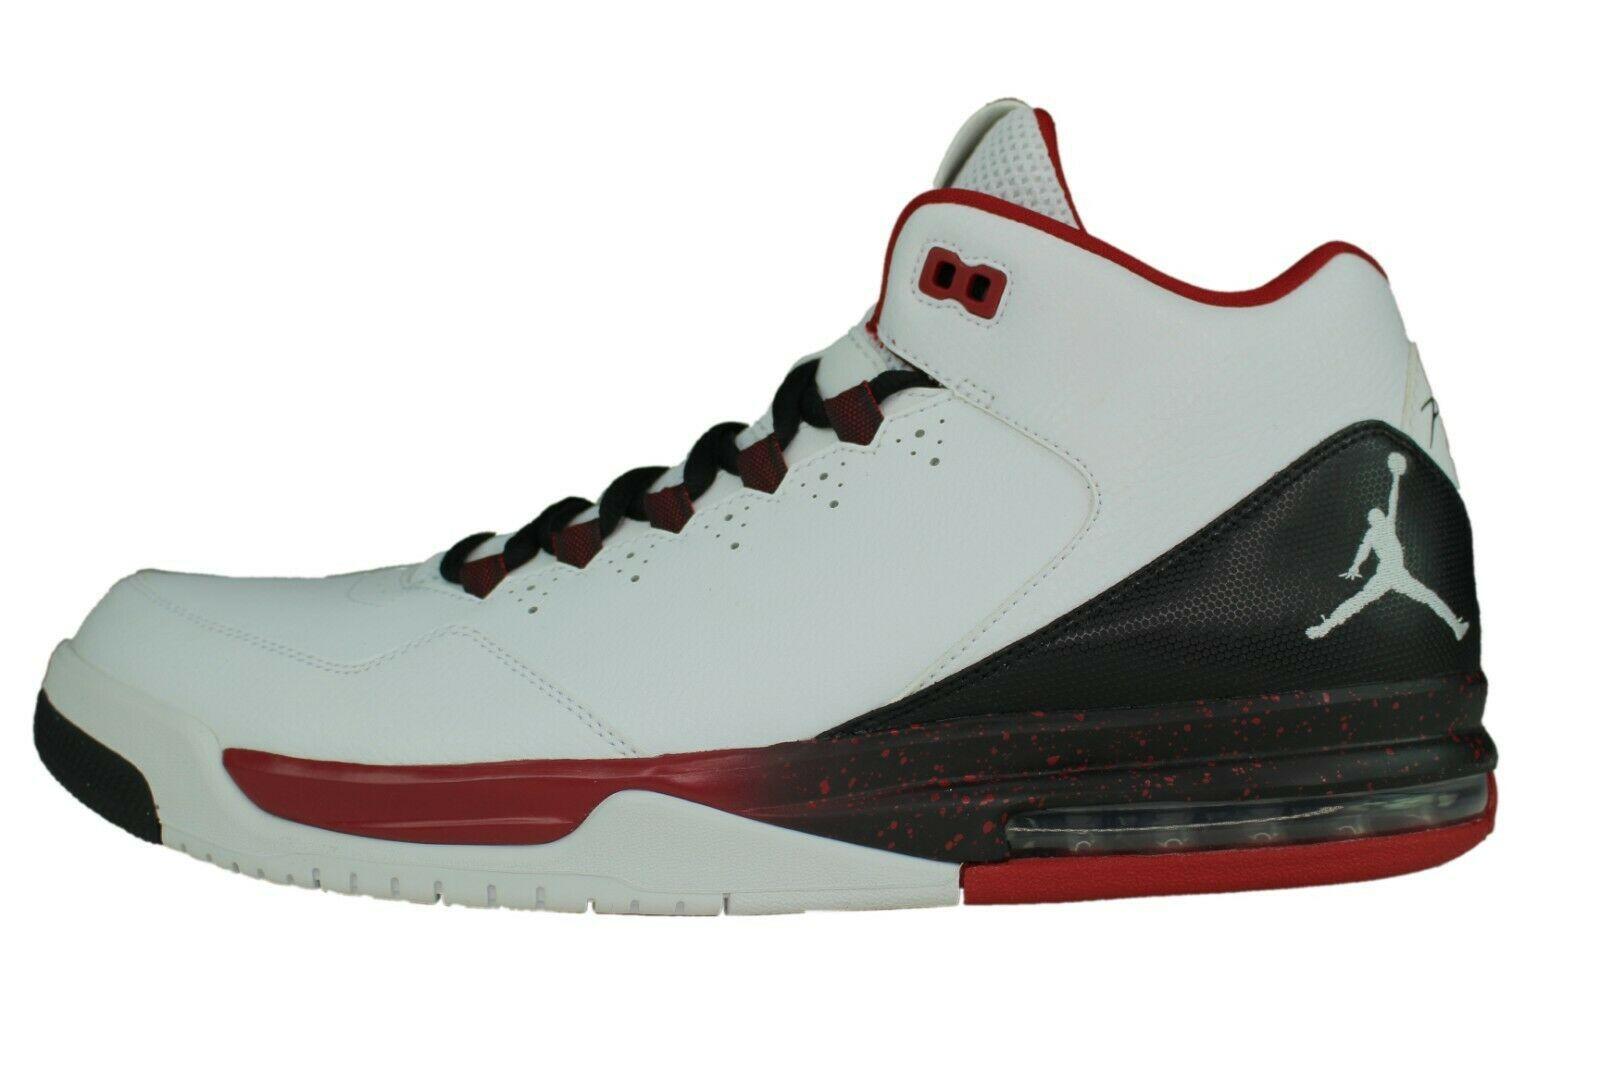 Jordan Flight Air Jordan Shoes: 1 customer review and 28